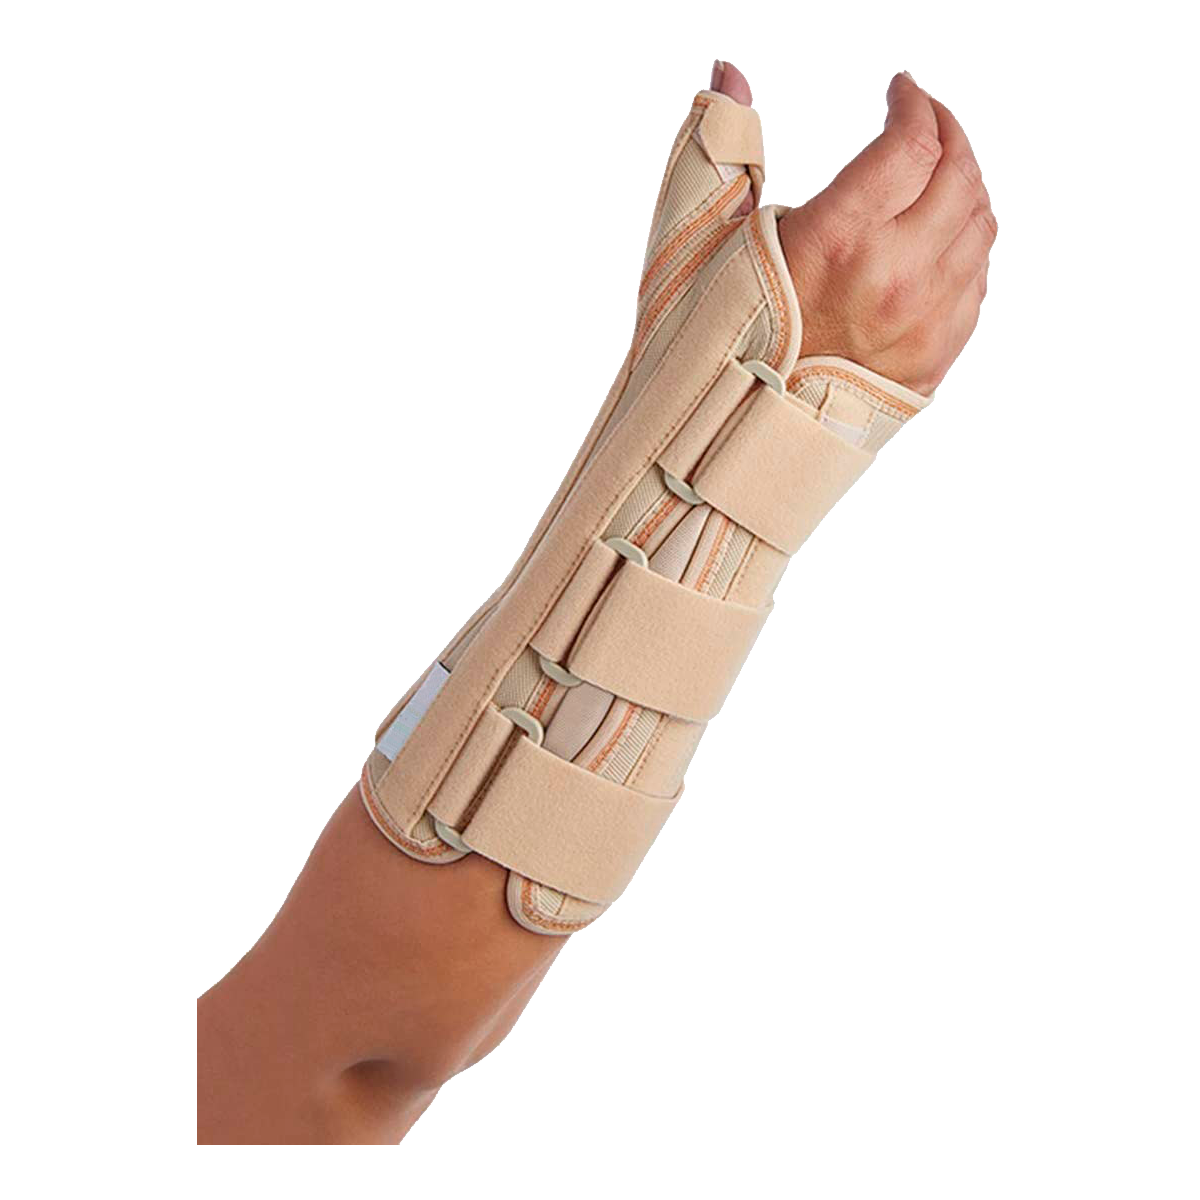 Palmar splints